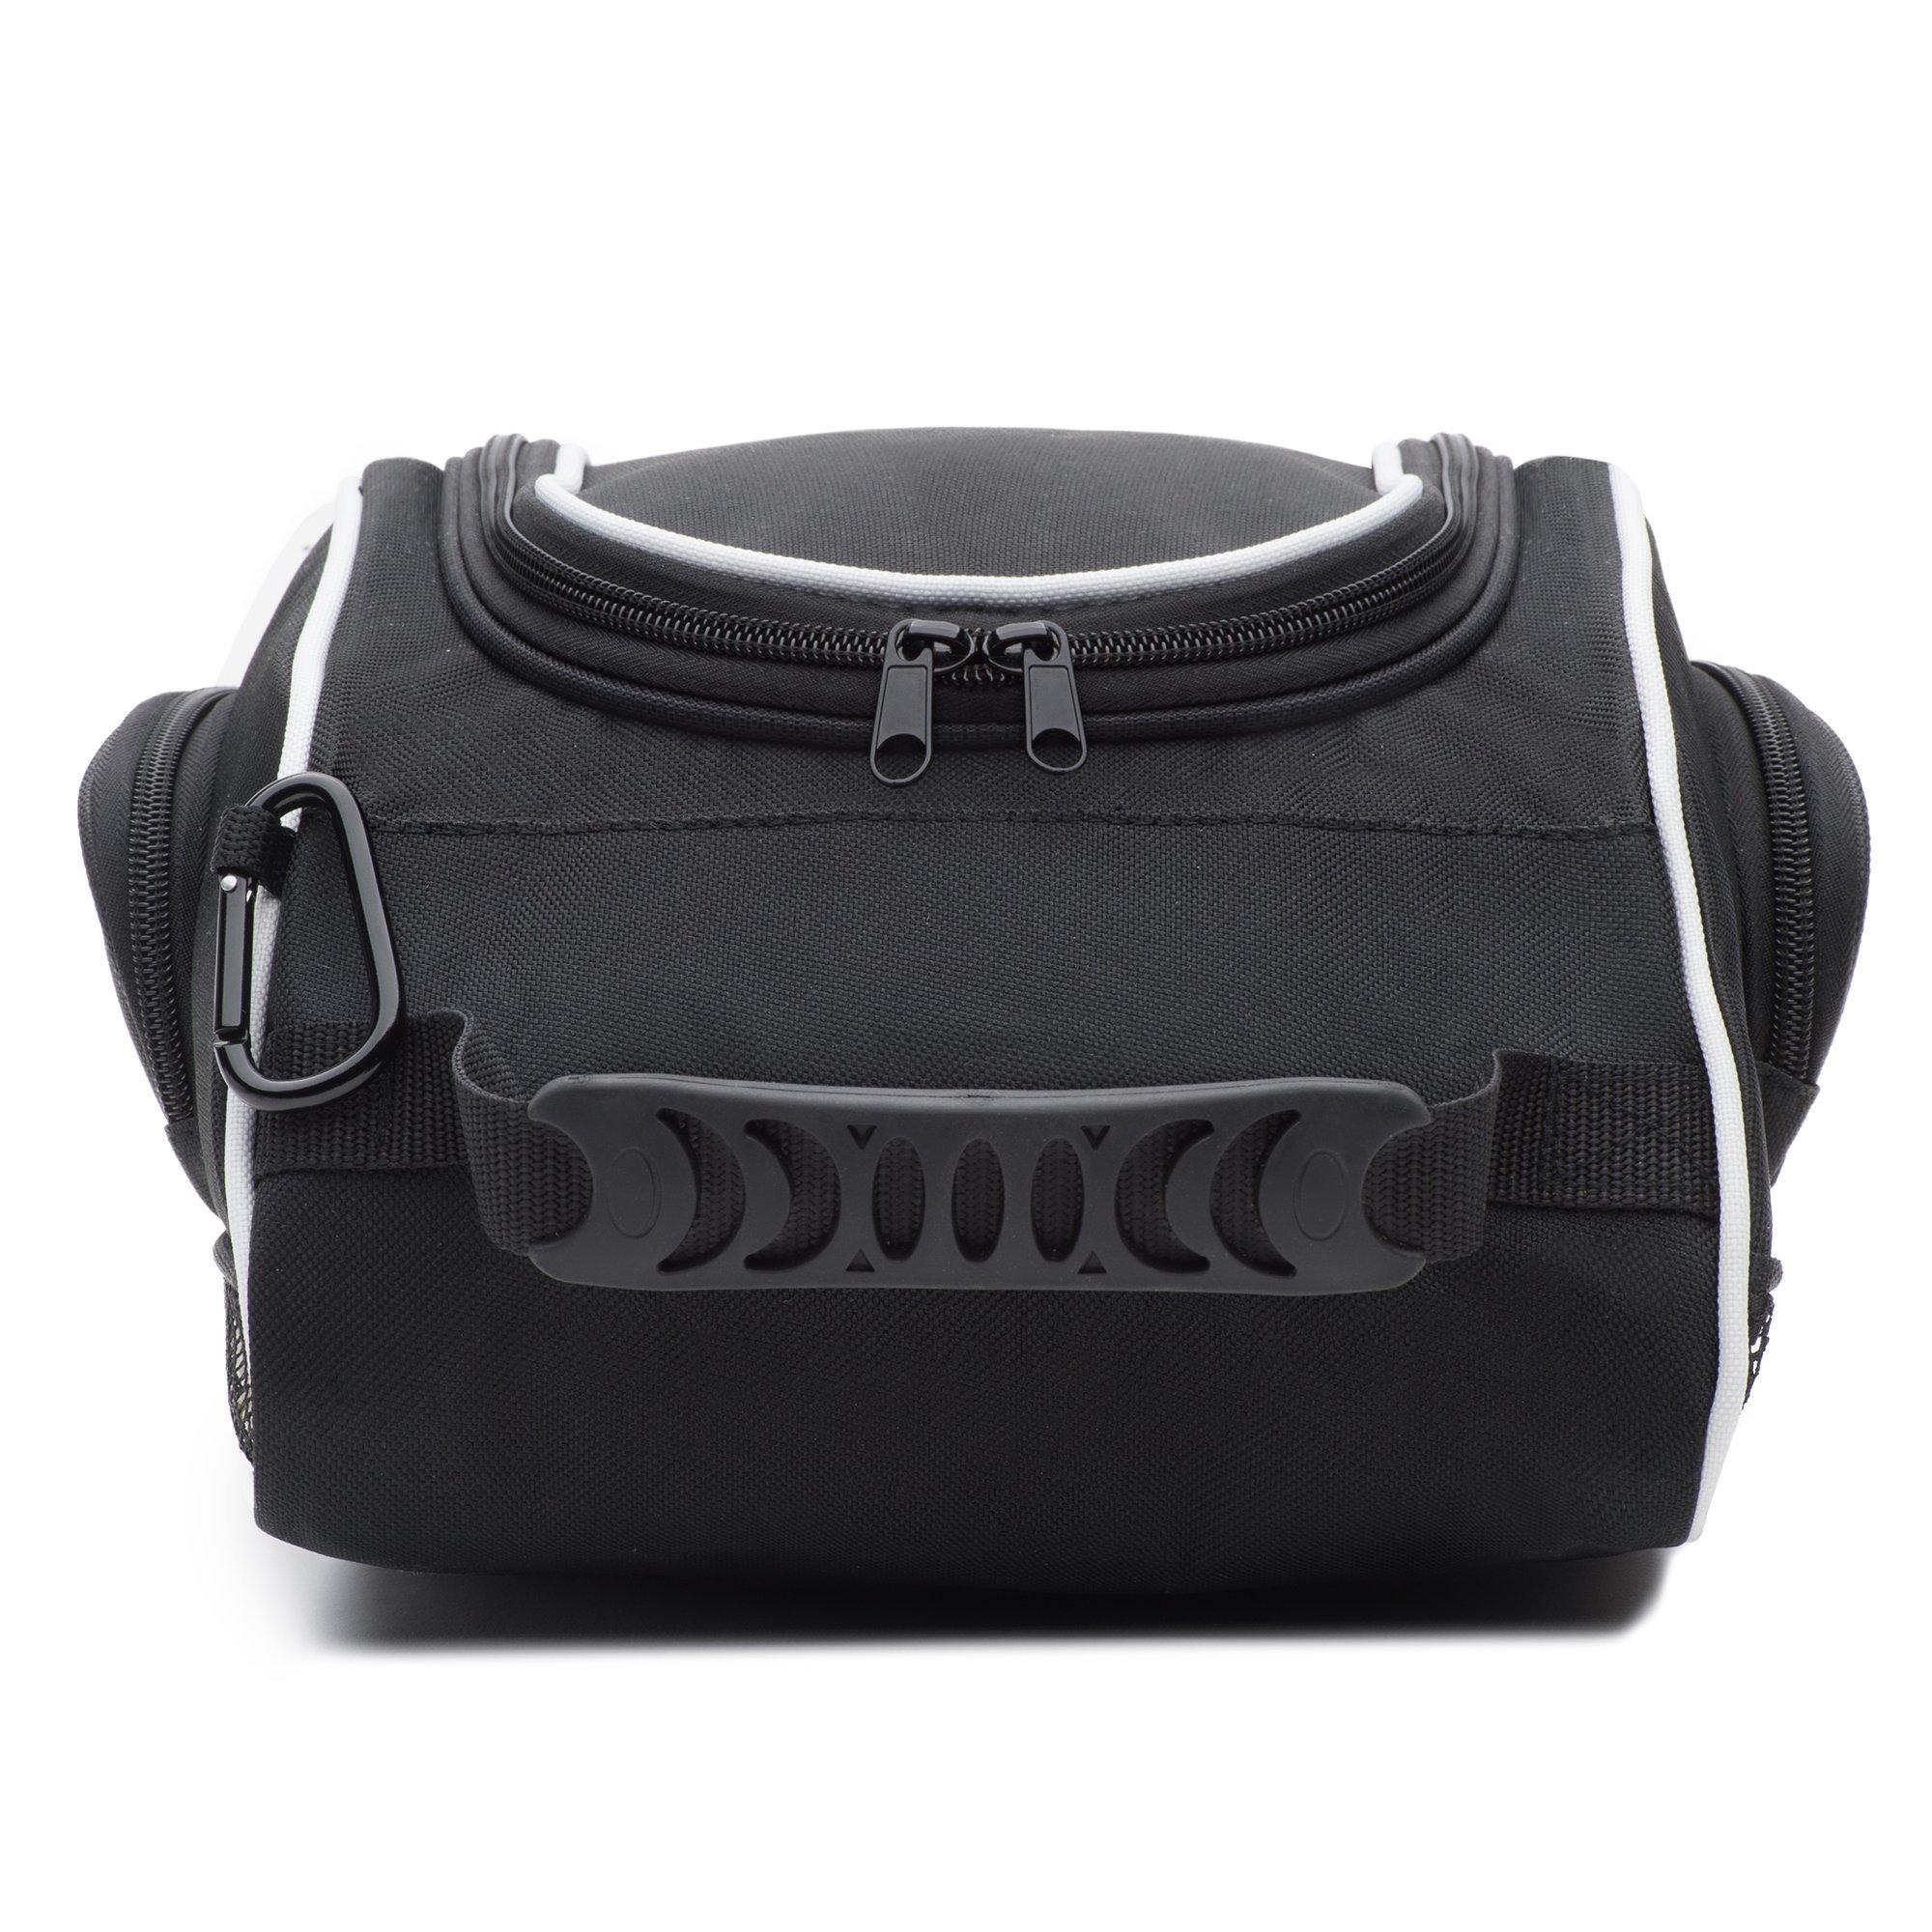 DesignWorks Golf Shoe Bag Tote for Men and Women, Hanging Clip and Large Zippered Side-Pockets, includes Golf Accessories Bonus by DesignWorks (Image #5)